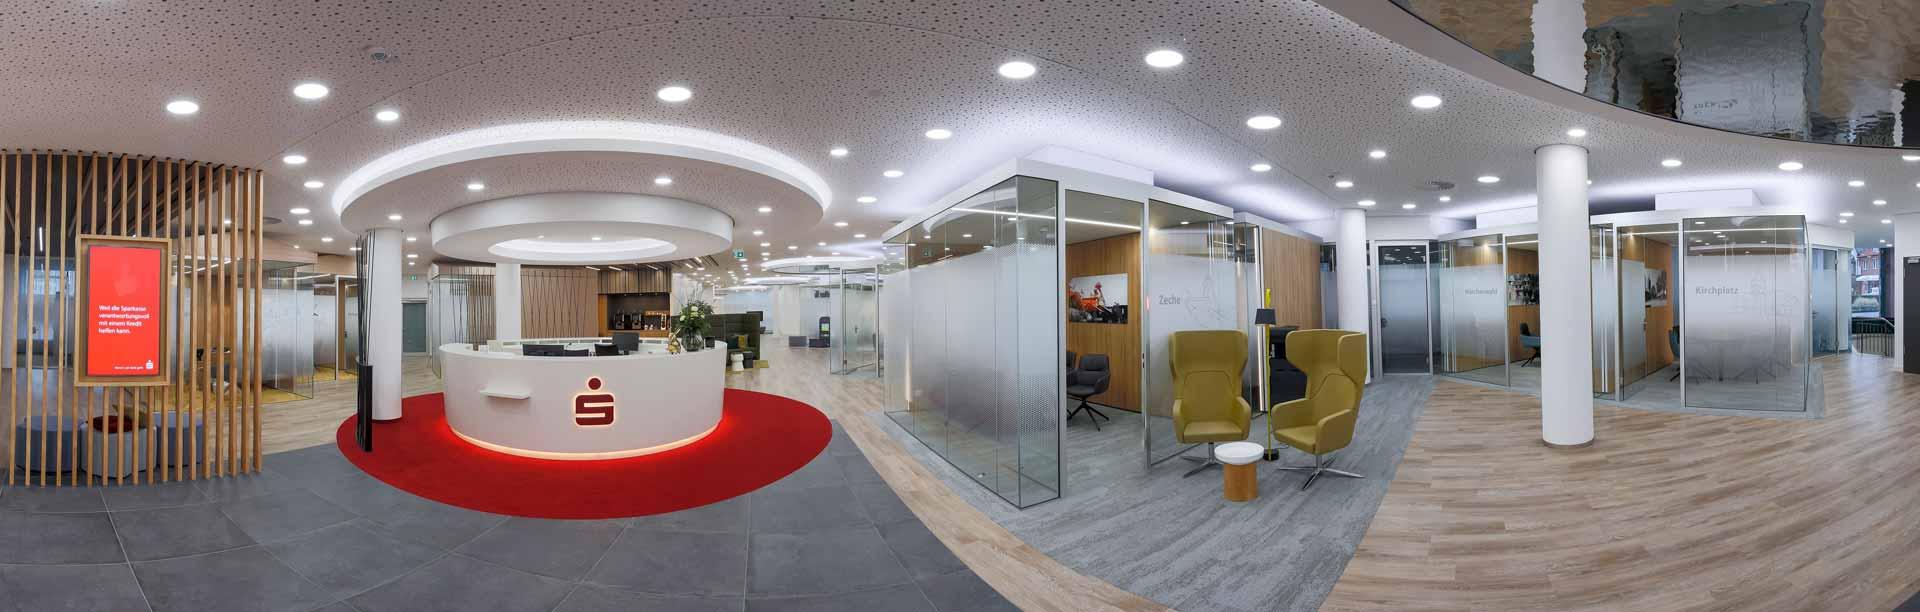 Raum-in-Raum vetroCUBE Bank